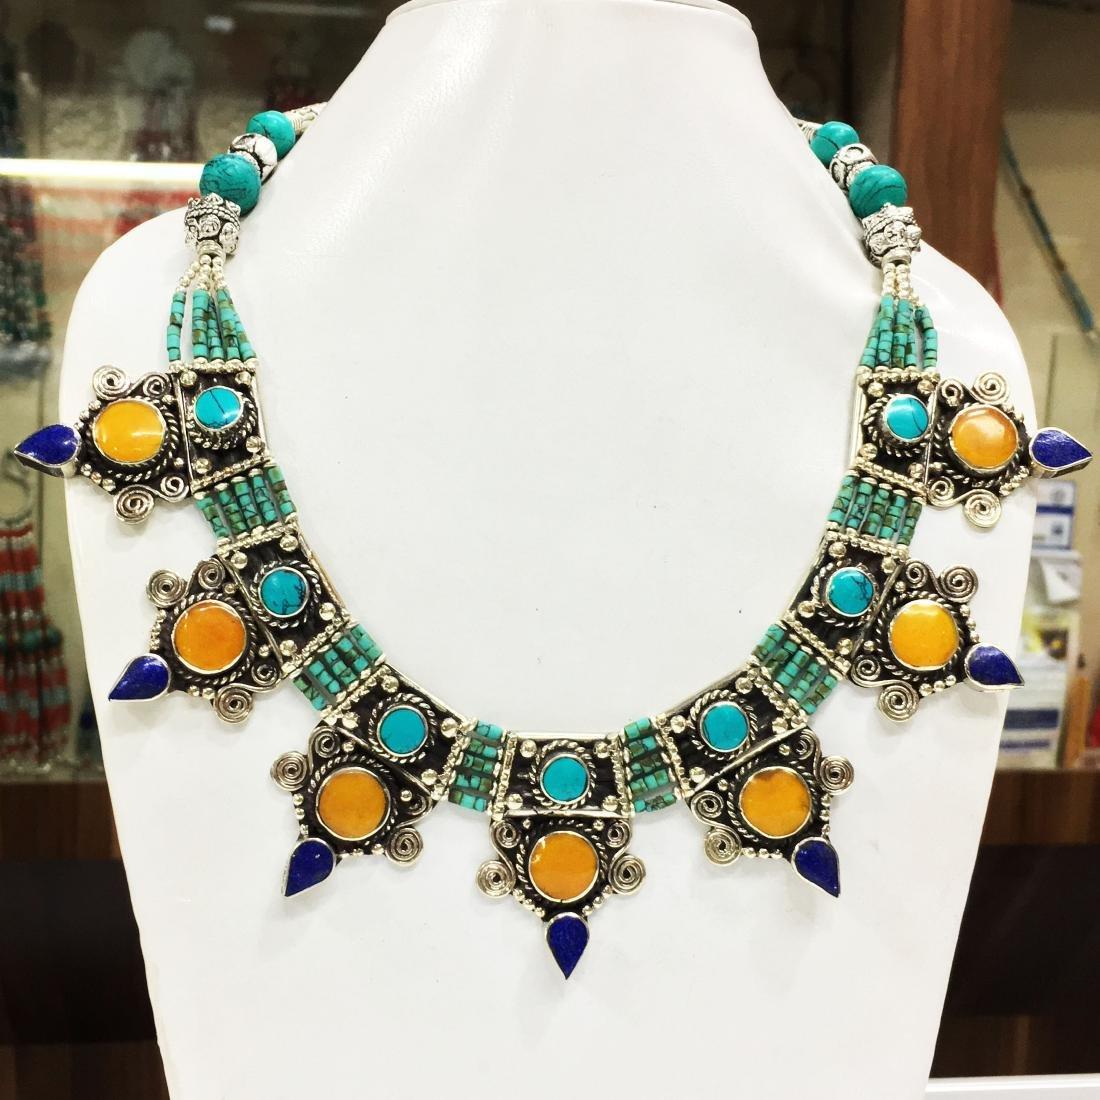 New Arrival - Tibetan Handmade Amber Nepali Necklace